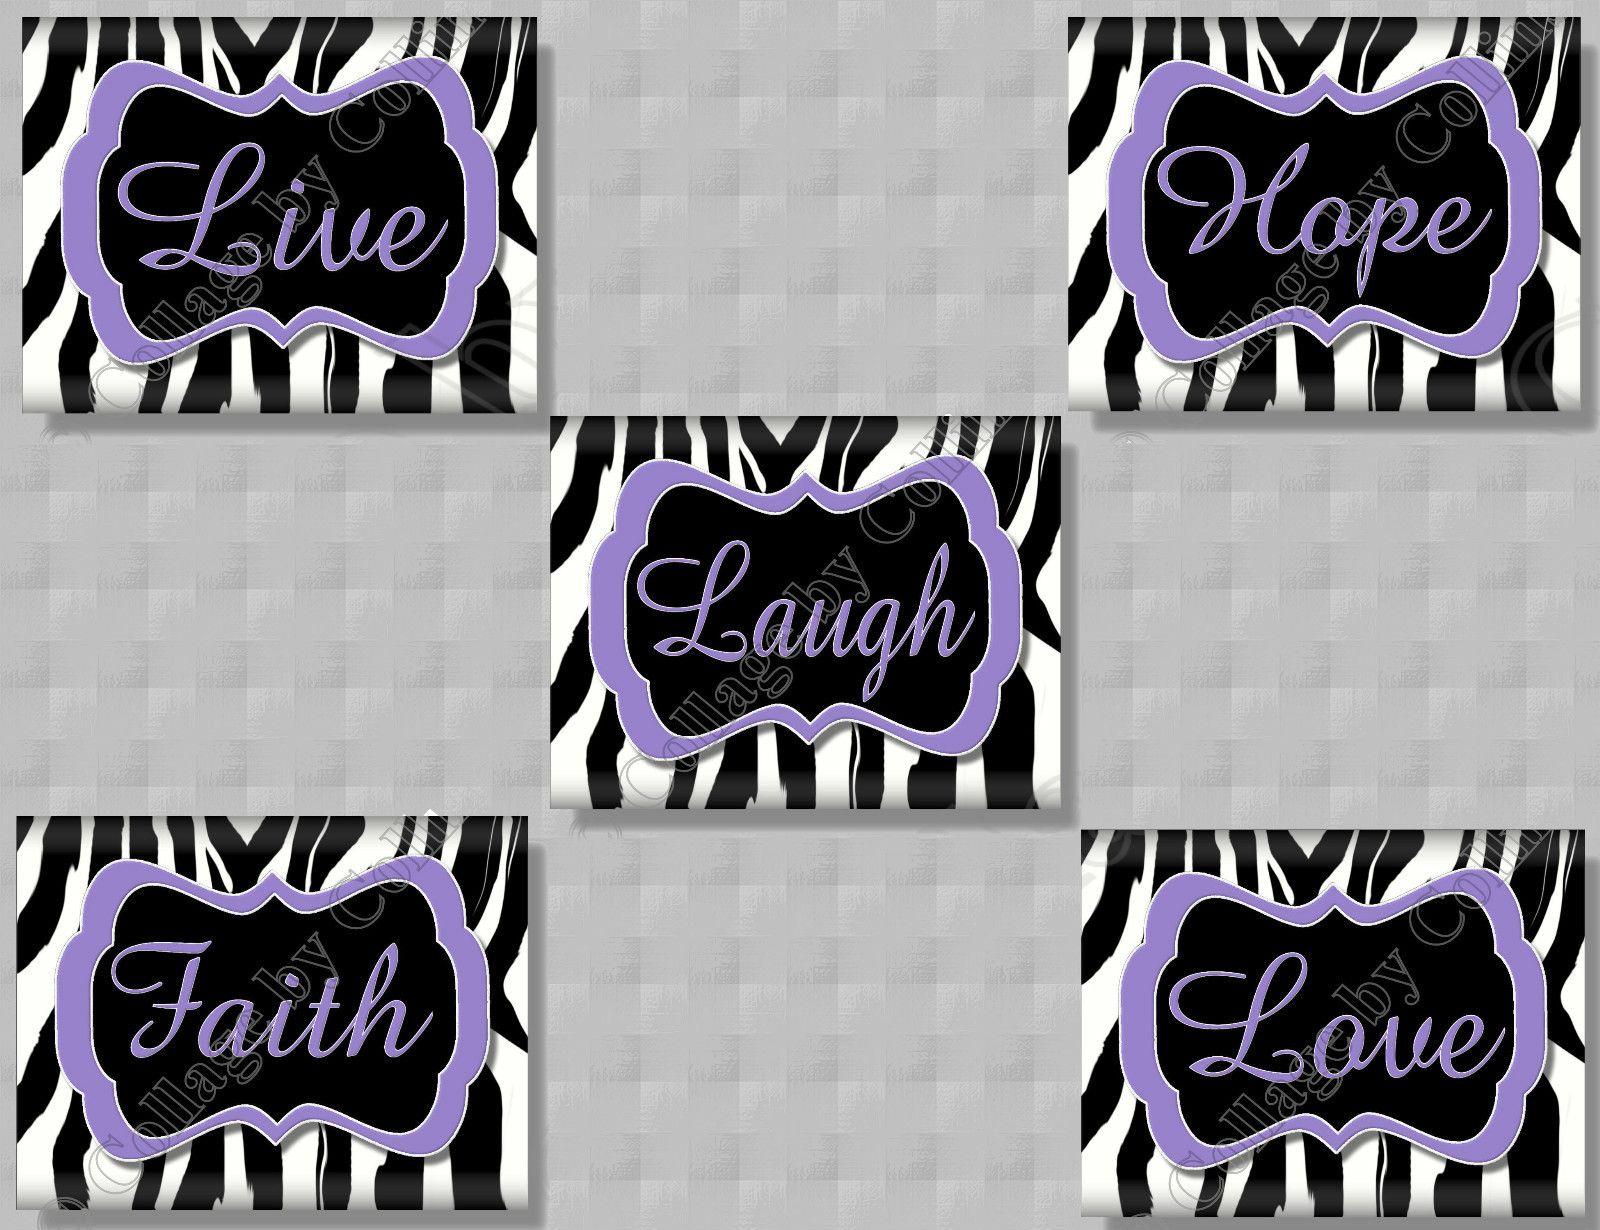 Zebra wall decor bedroom - 5 Purple Zebra Print Faith Hope Live Love Laugh Quote Art Girls Room Wall Decor